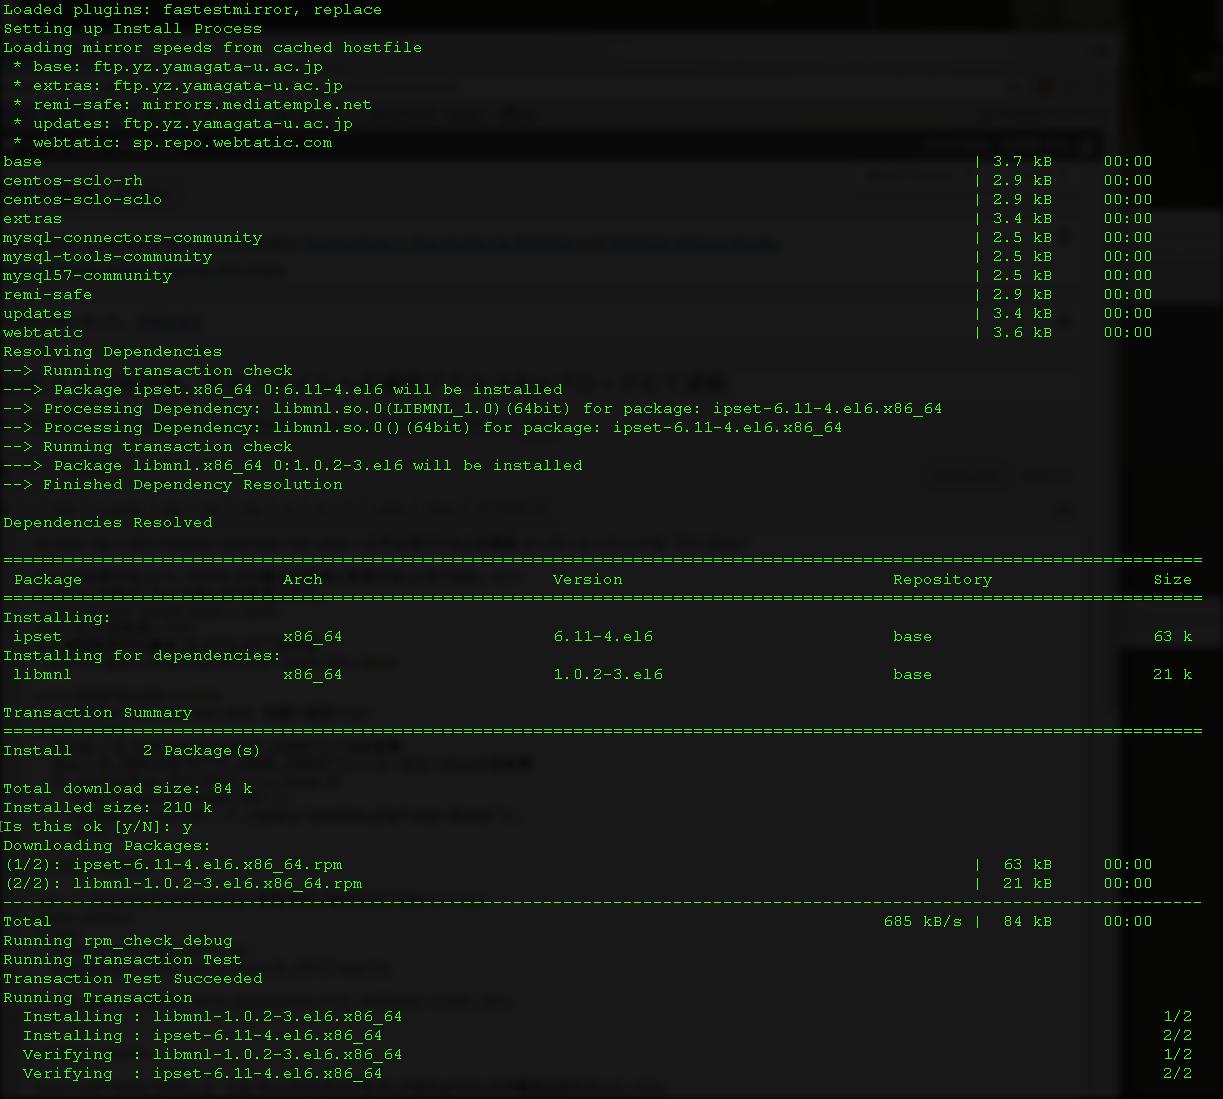 botによるDOS攻撃、特定ファイルへの連続アクセスをipブロックにて遮断